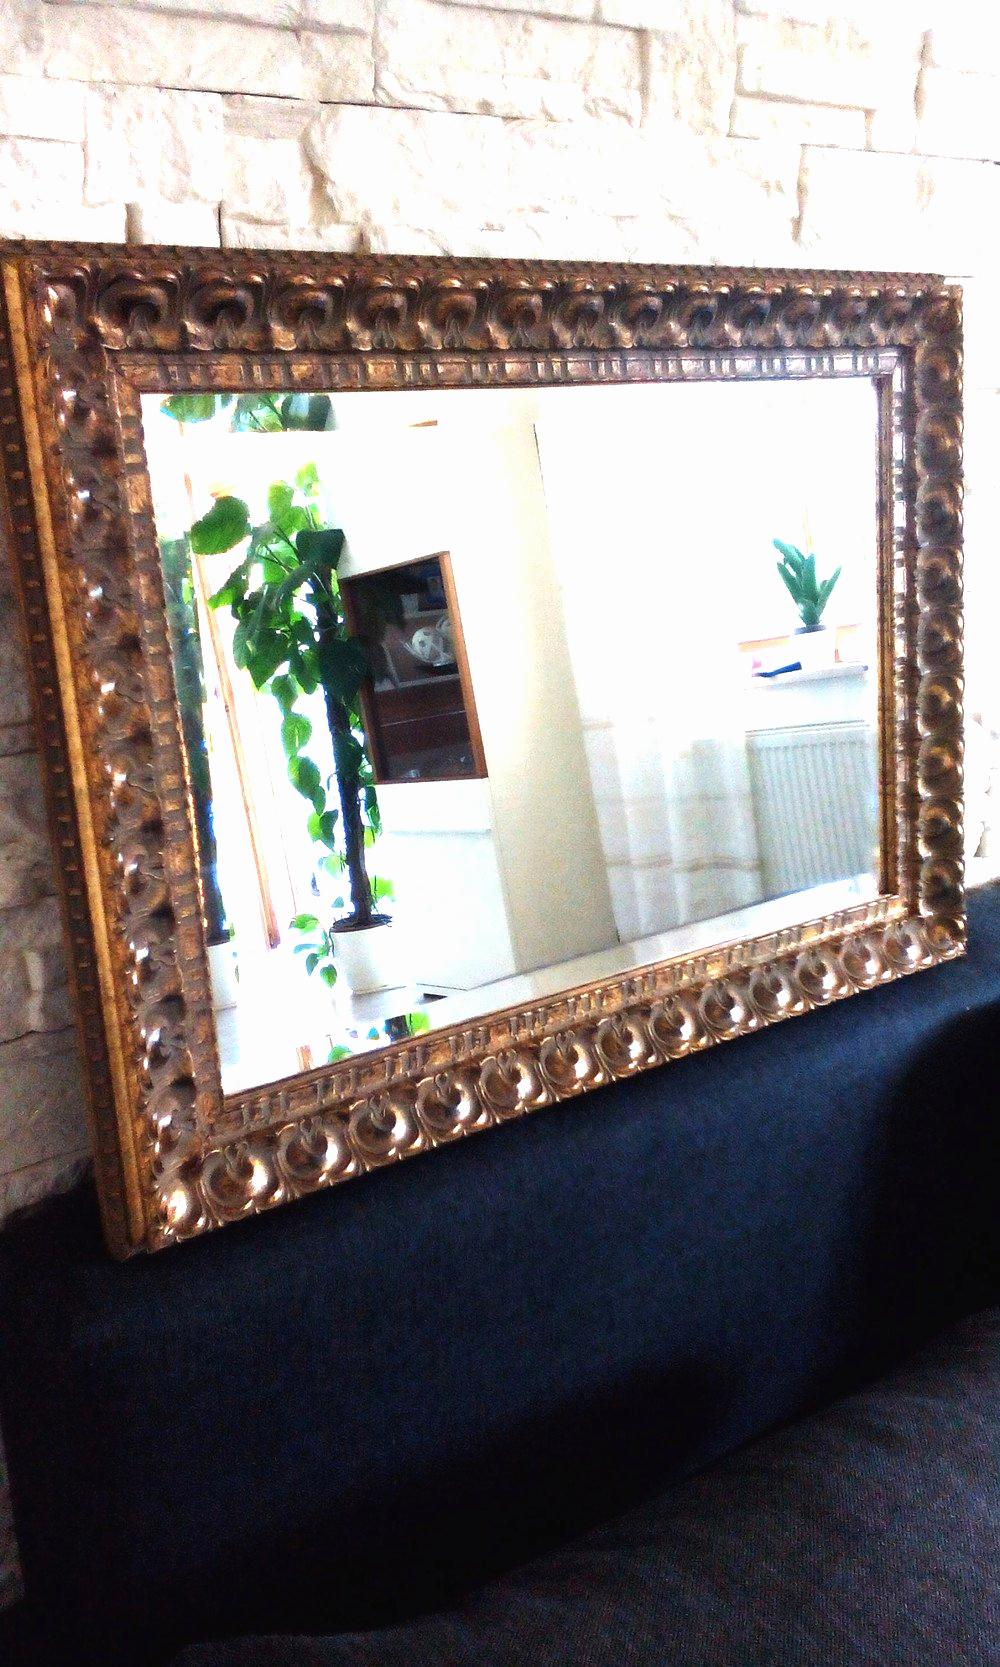 bilderrahmen dekorieren ideen inspirierend spiegel mit rahmen antik bilderrahmen silber 0d design ideen of bilderrahmen dekorieren ideen